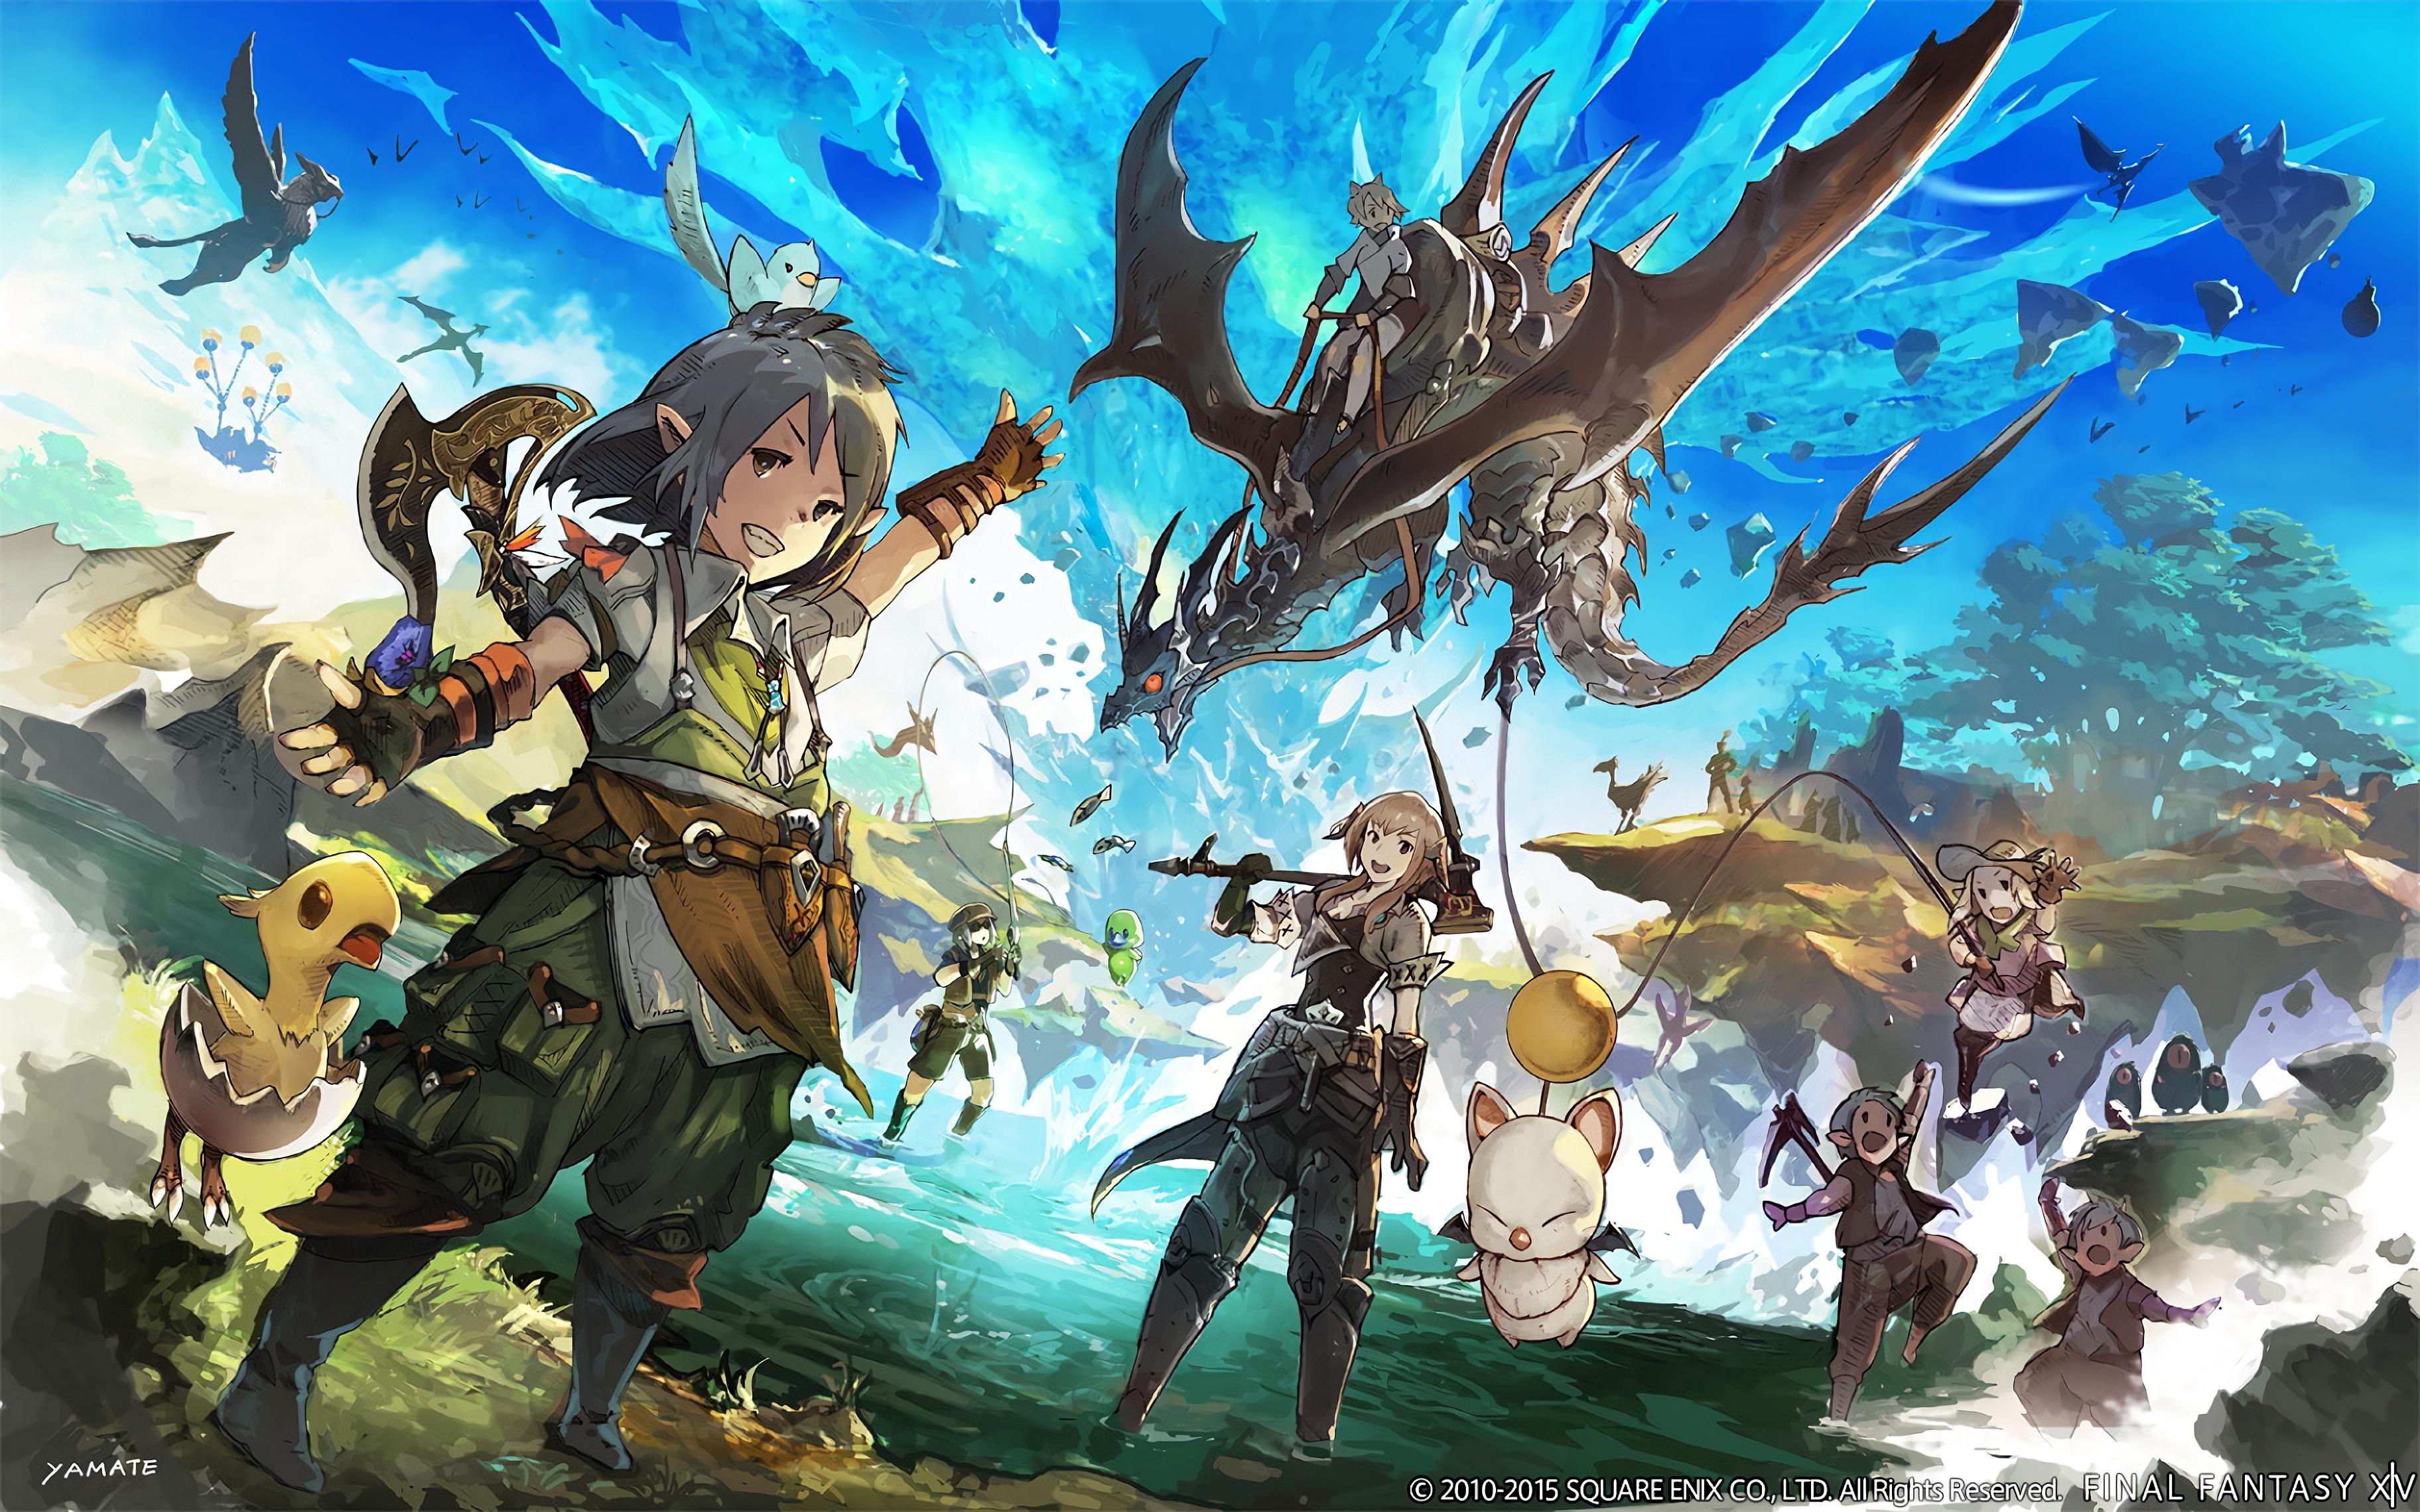 Ffxiv 4k Wallpaper Album Album On Imgur Final Fantasy Xiv Final Fantasy 14 Fantasy